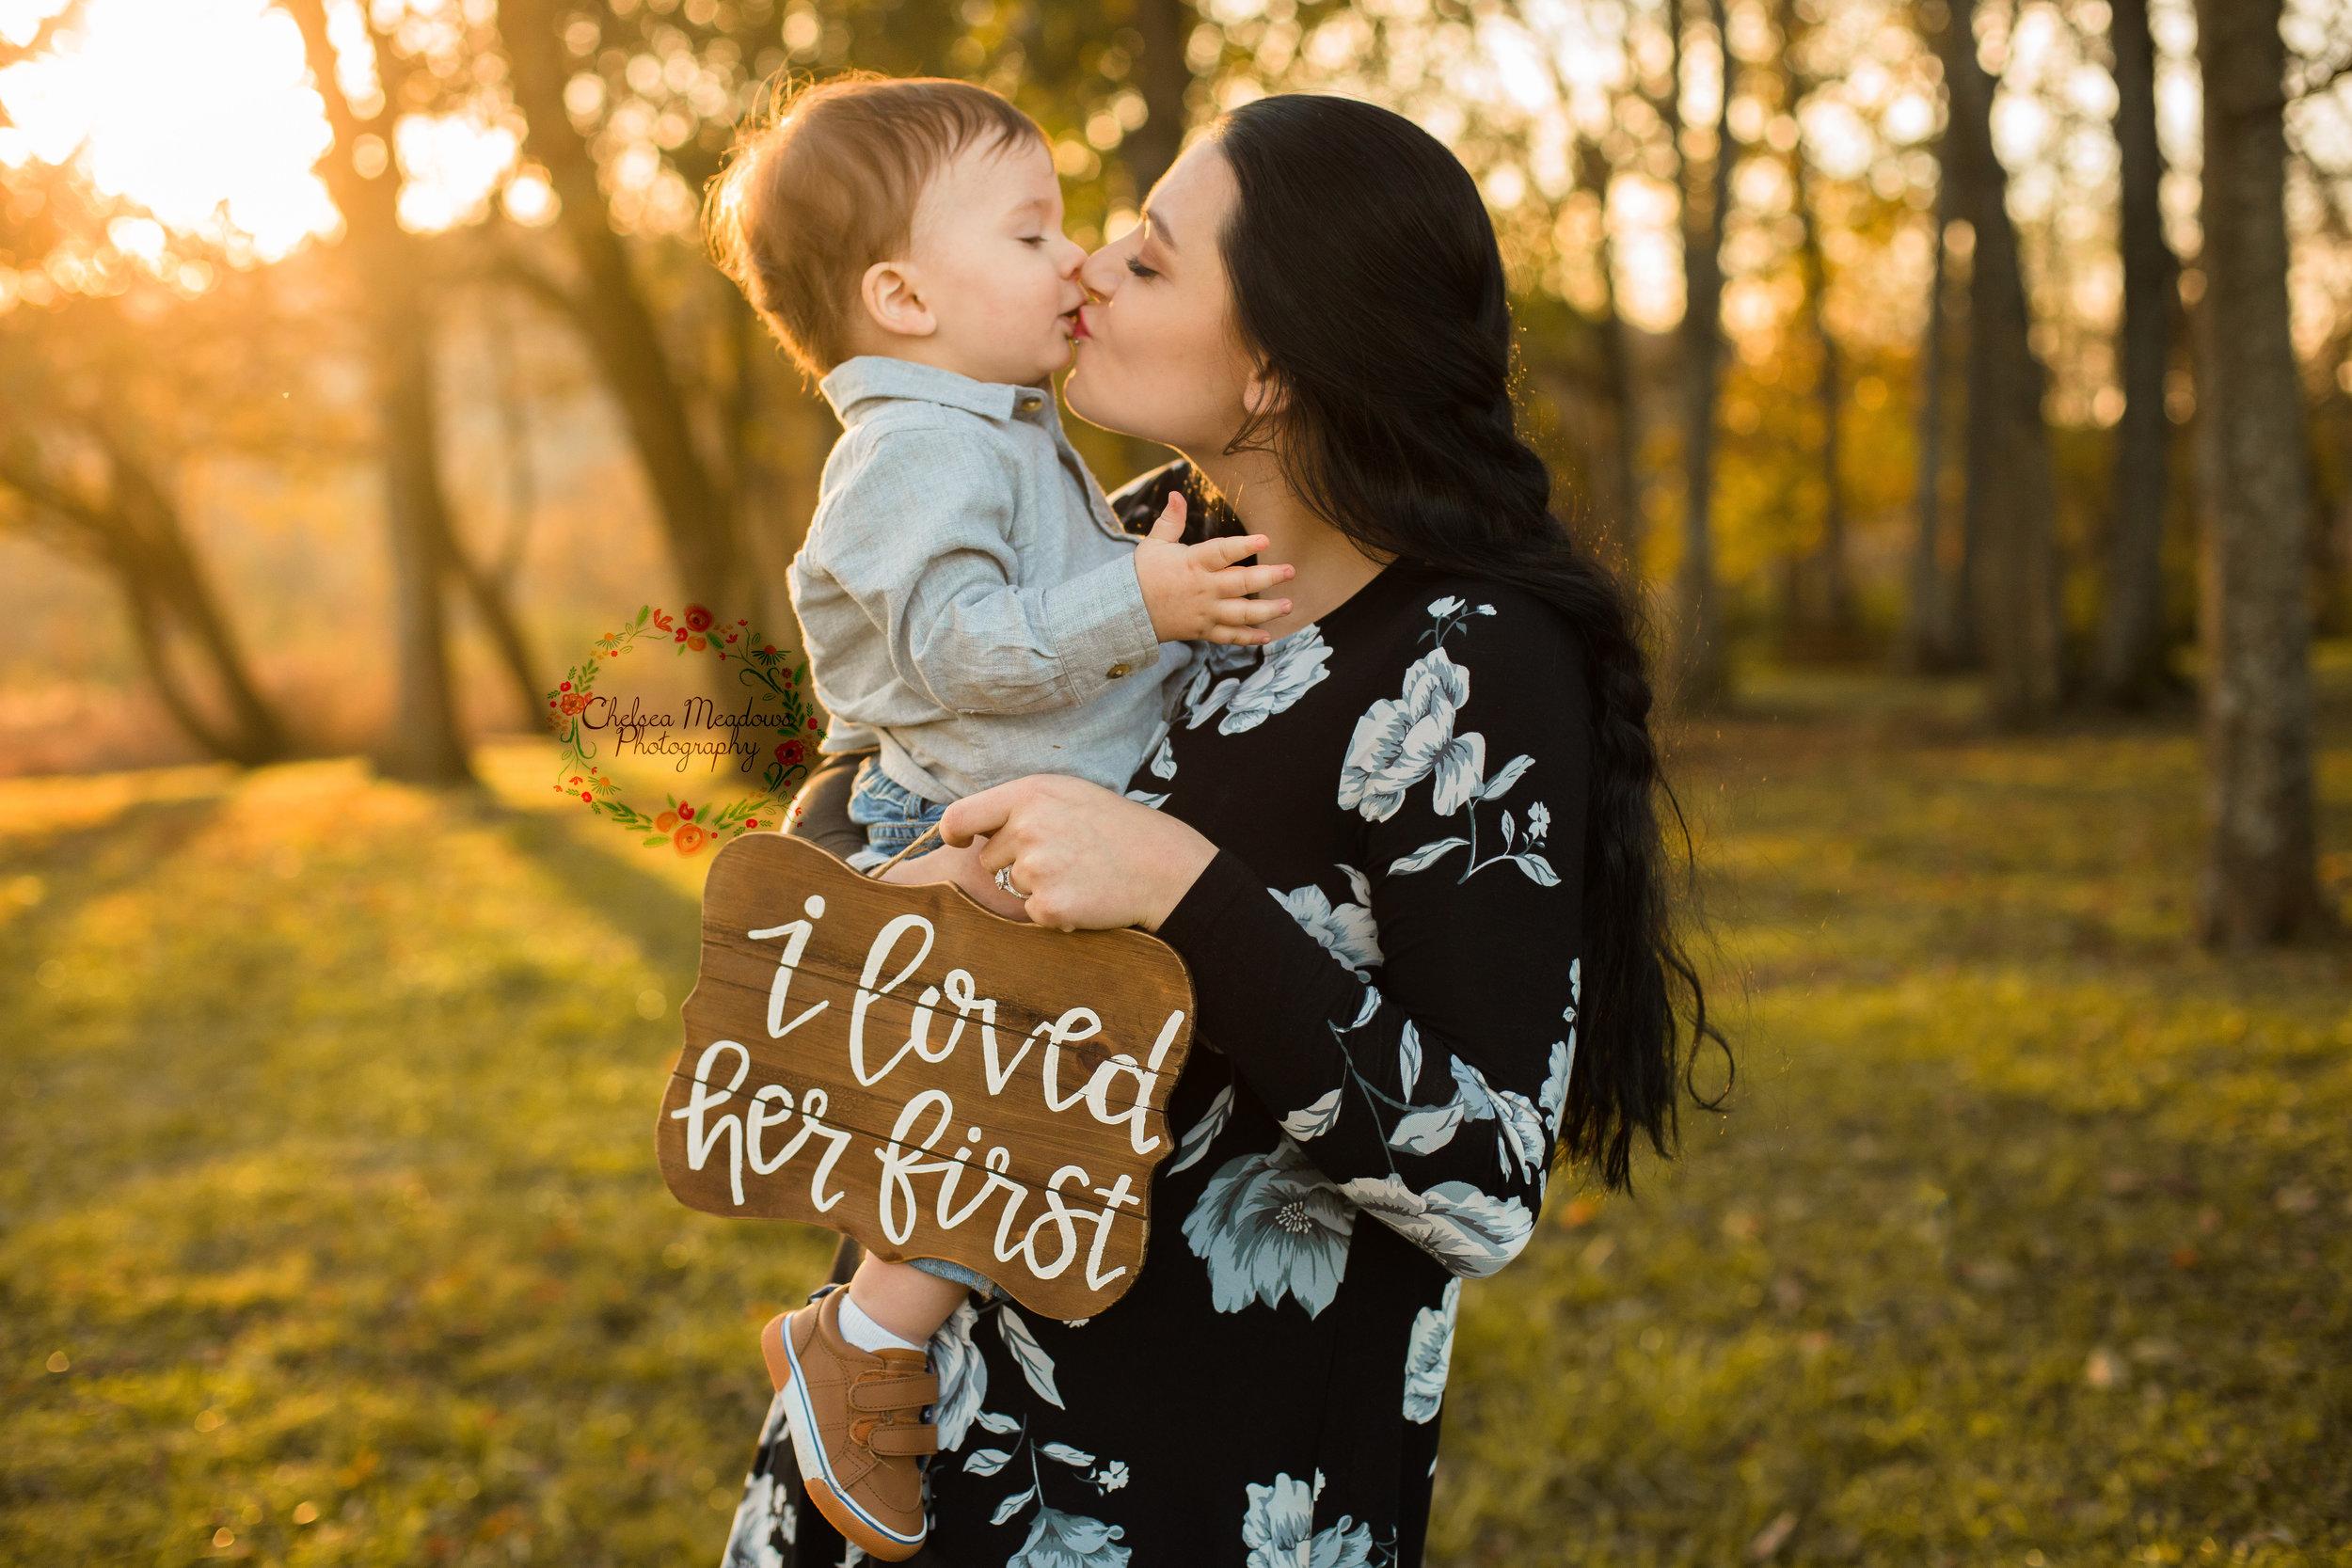 Jessica & Derek Engagement - Nashville Wedding Photographer - Chelsea Meadows Photography (20).jpg